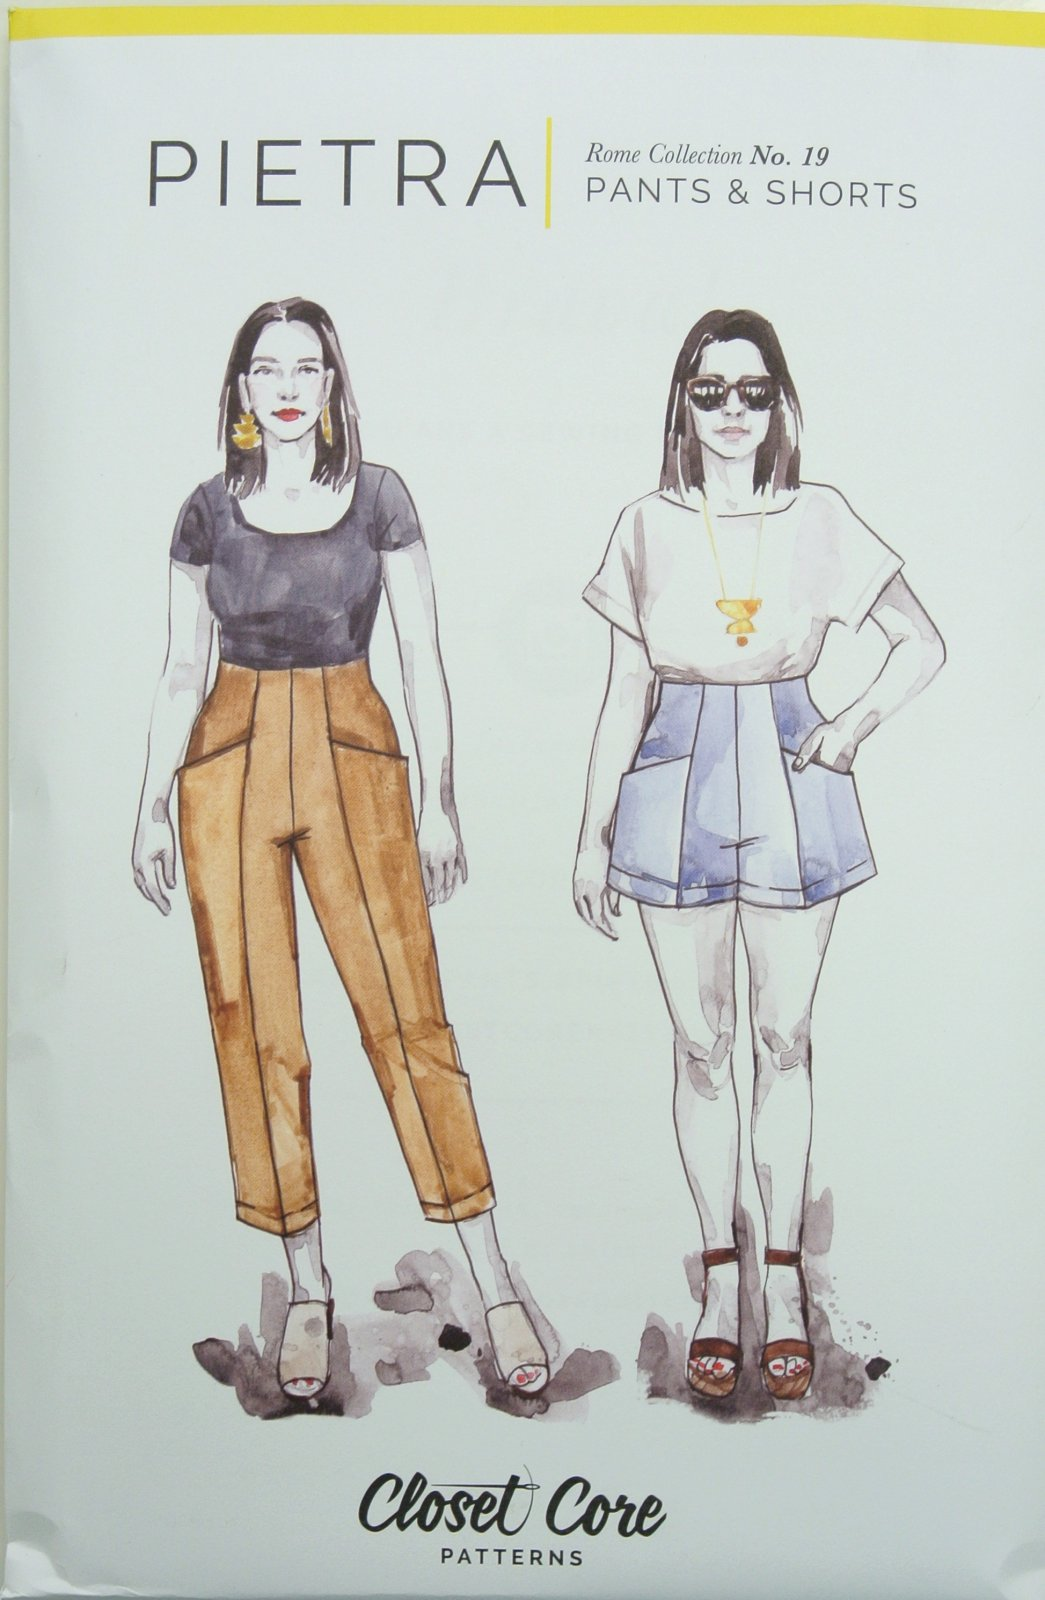 Pietra Pants and Shorts